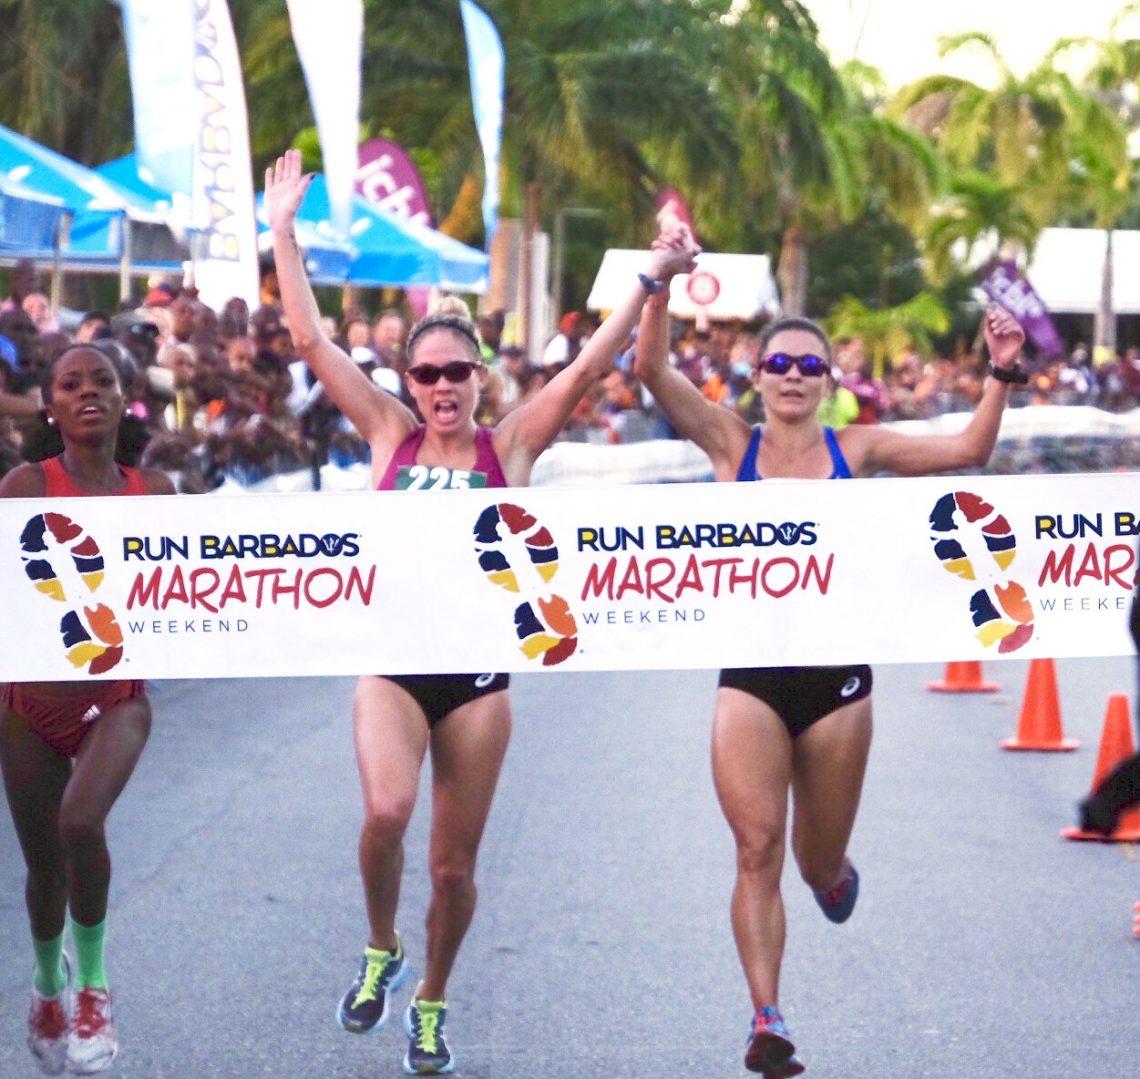 Barbad anile chak ane Run Barbados seri ane sa a